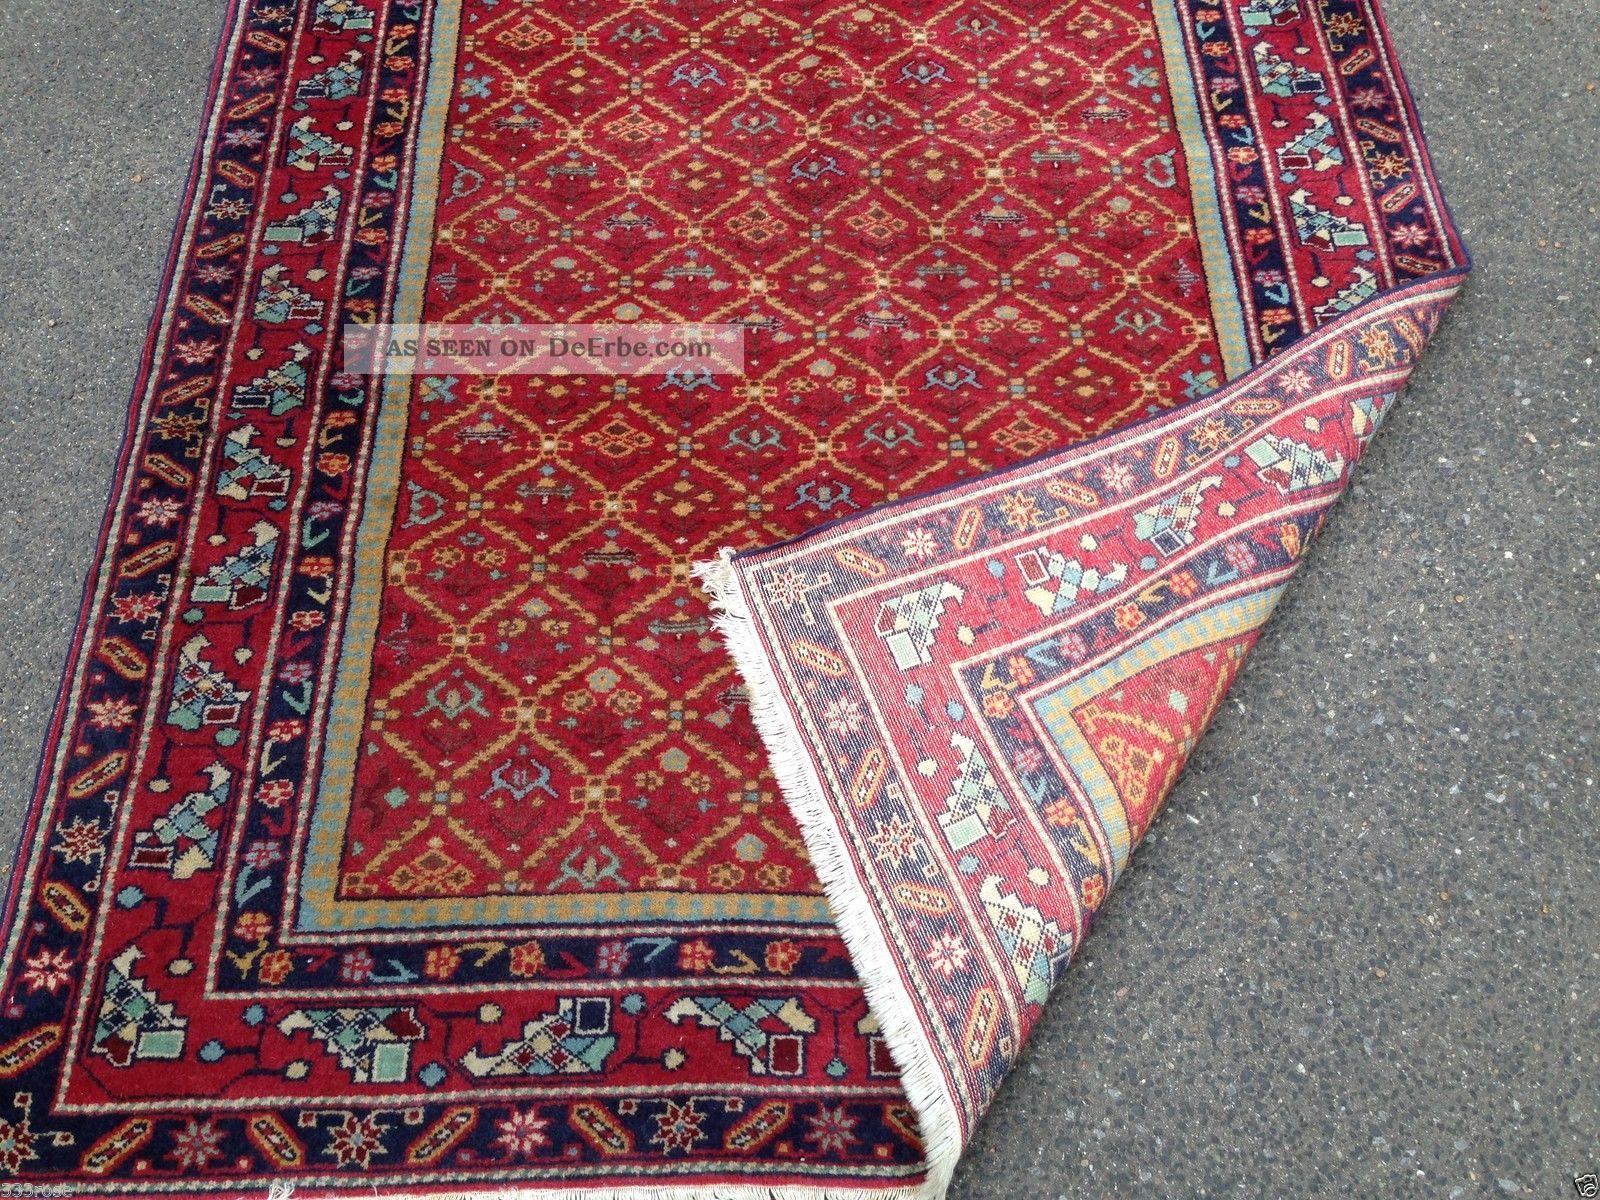 teppich handgekn pft belutch kazak kaukasisch 186x120 cm carpet tappeto tapis. Black Bedroom Furniture Sets. Home Design Ideas